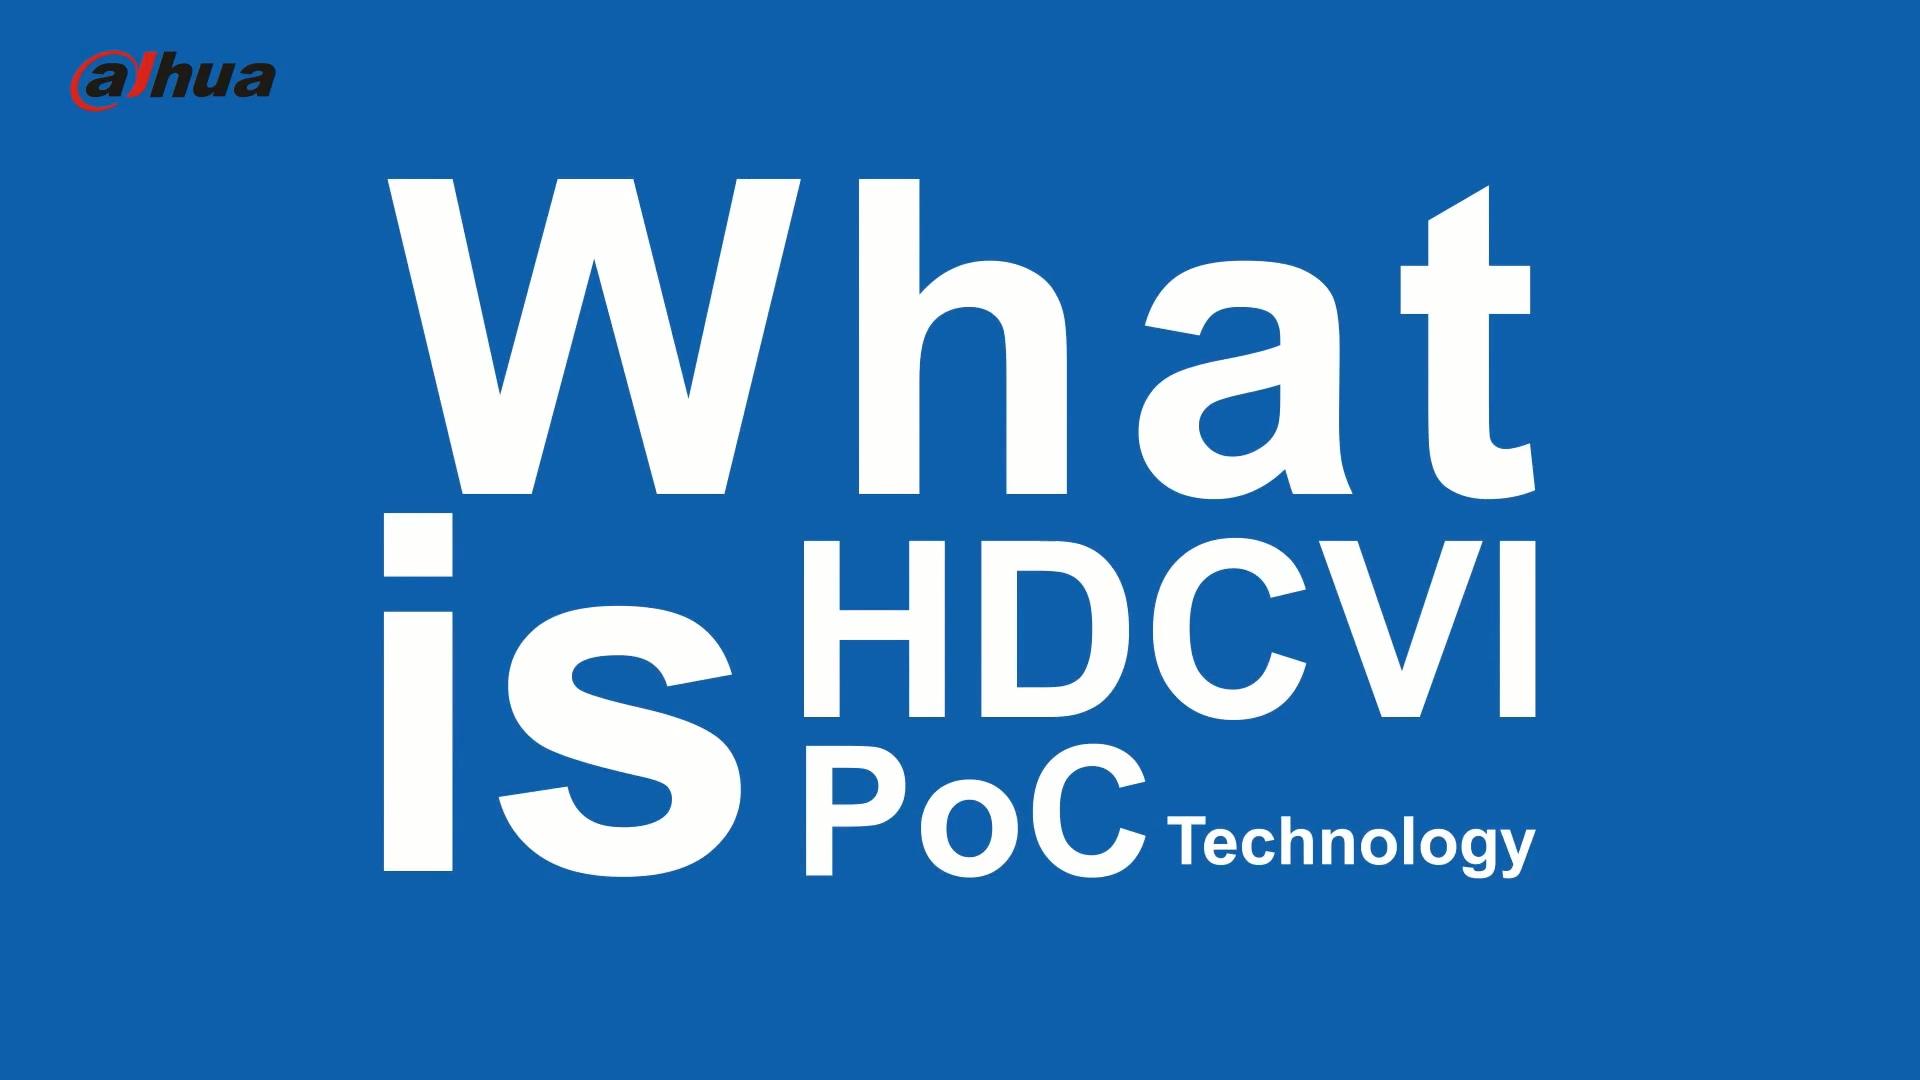 Dahua HDCVI PoC